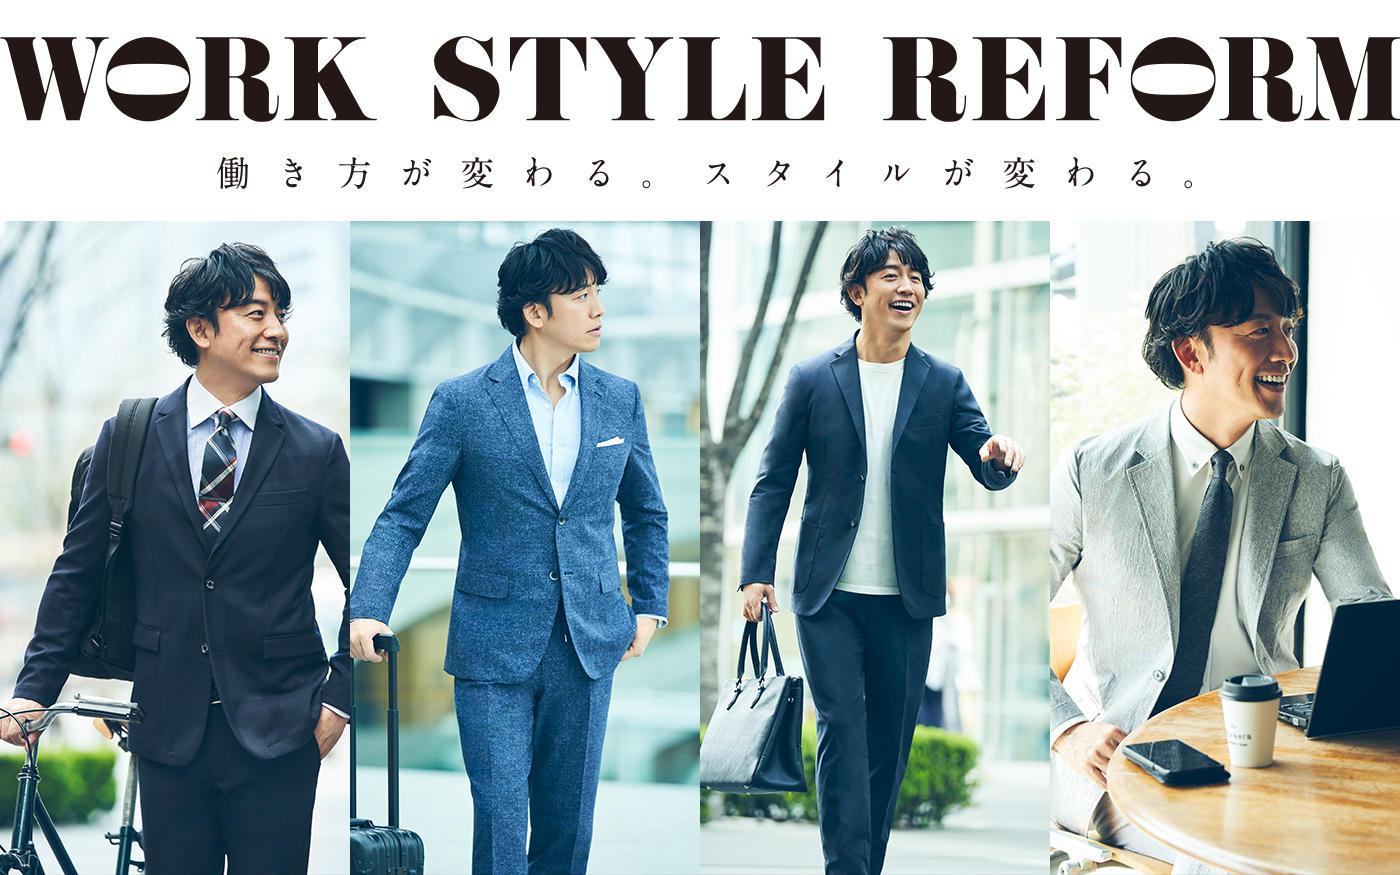 WORK STYLE REFORM ― ||働き方が変わる。スタイルが変わる。 vol.2